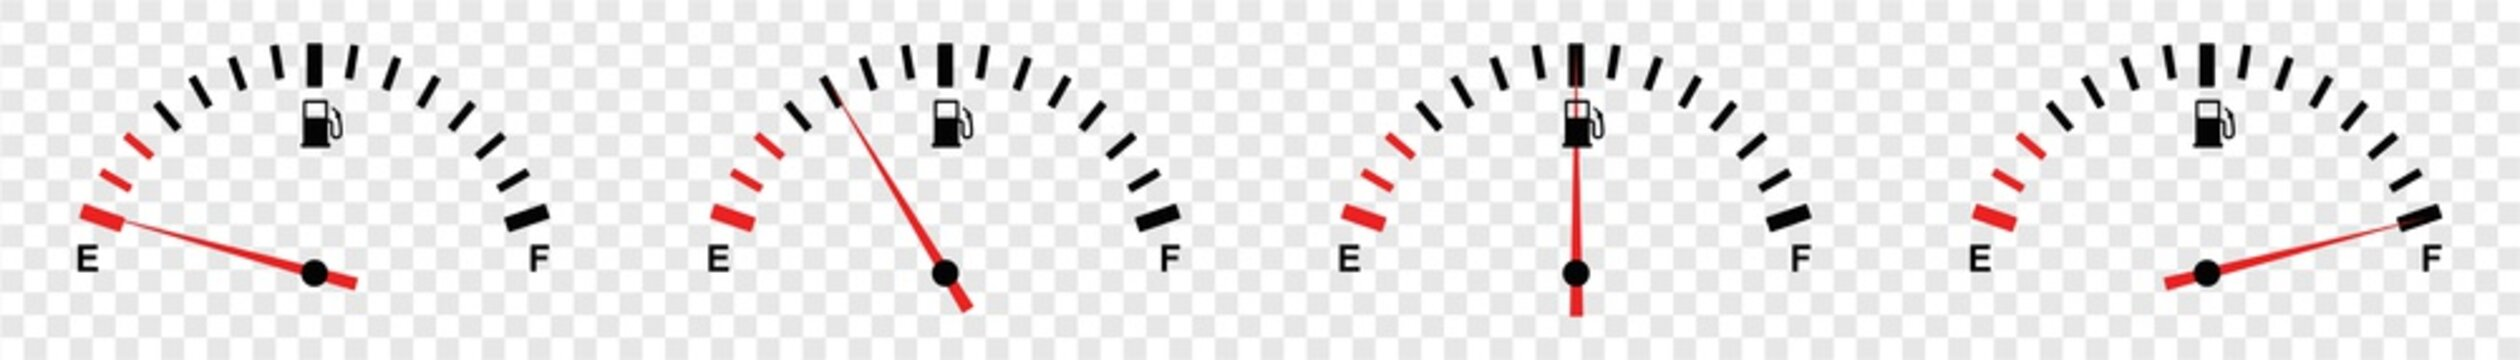 full fuel gauge icon set, vector illustration